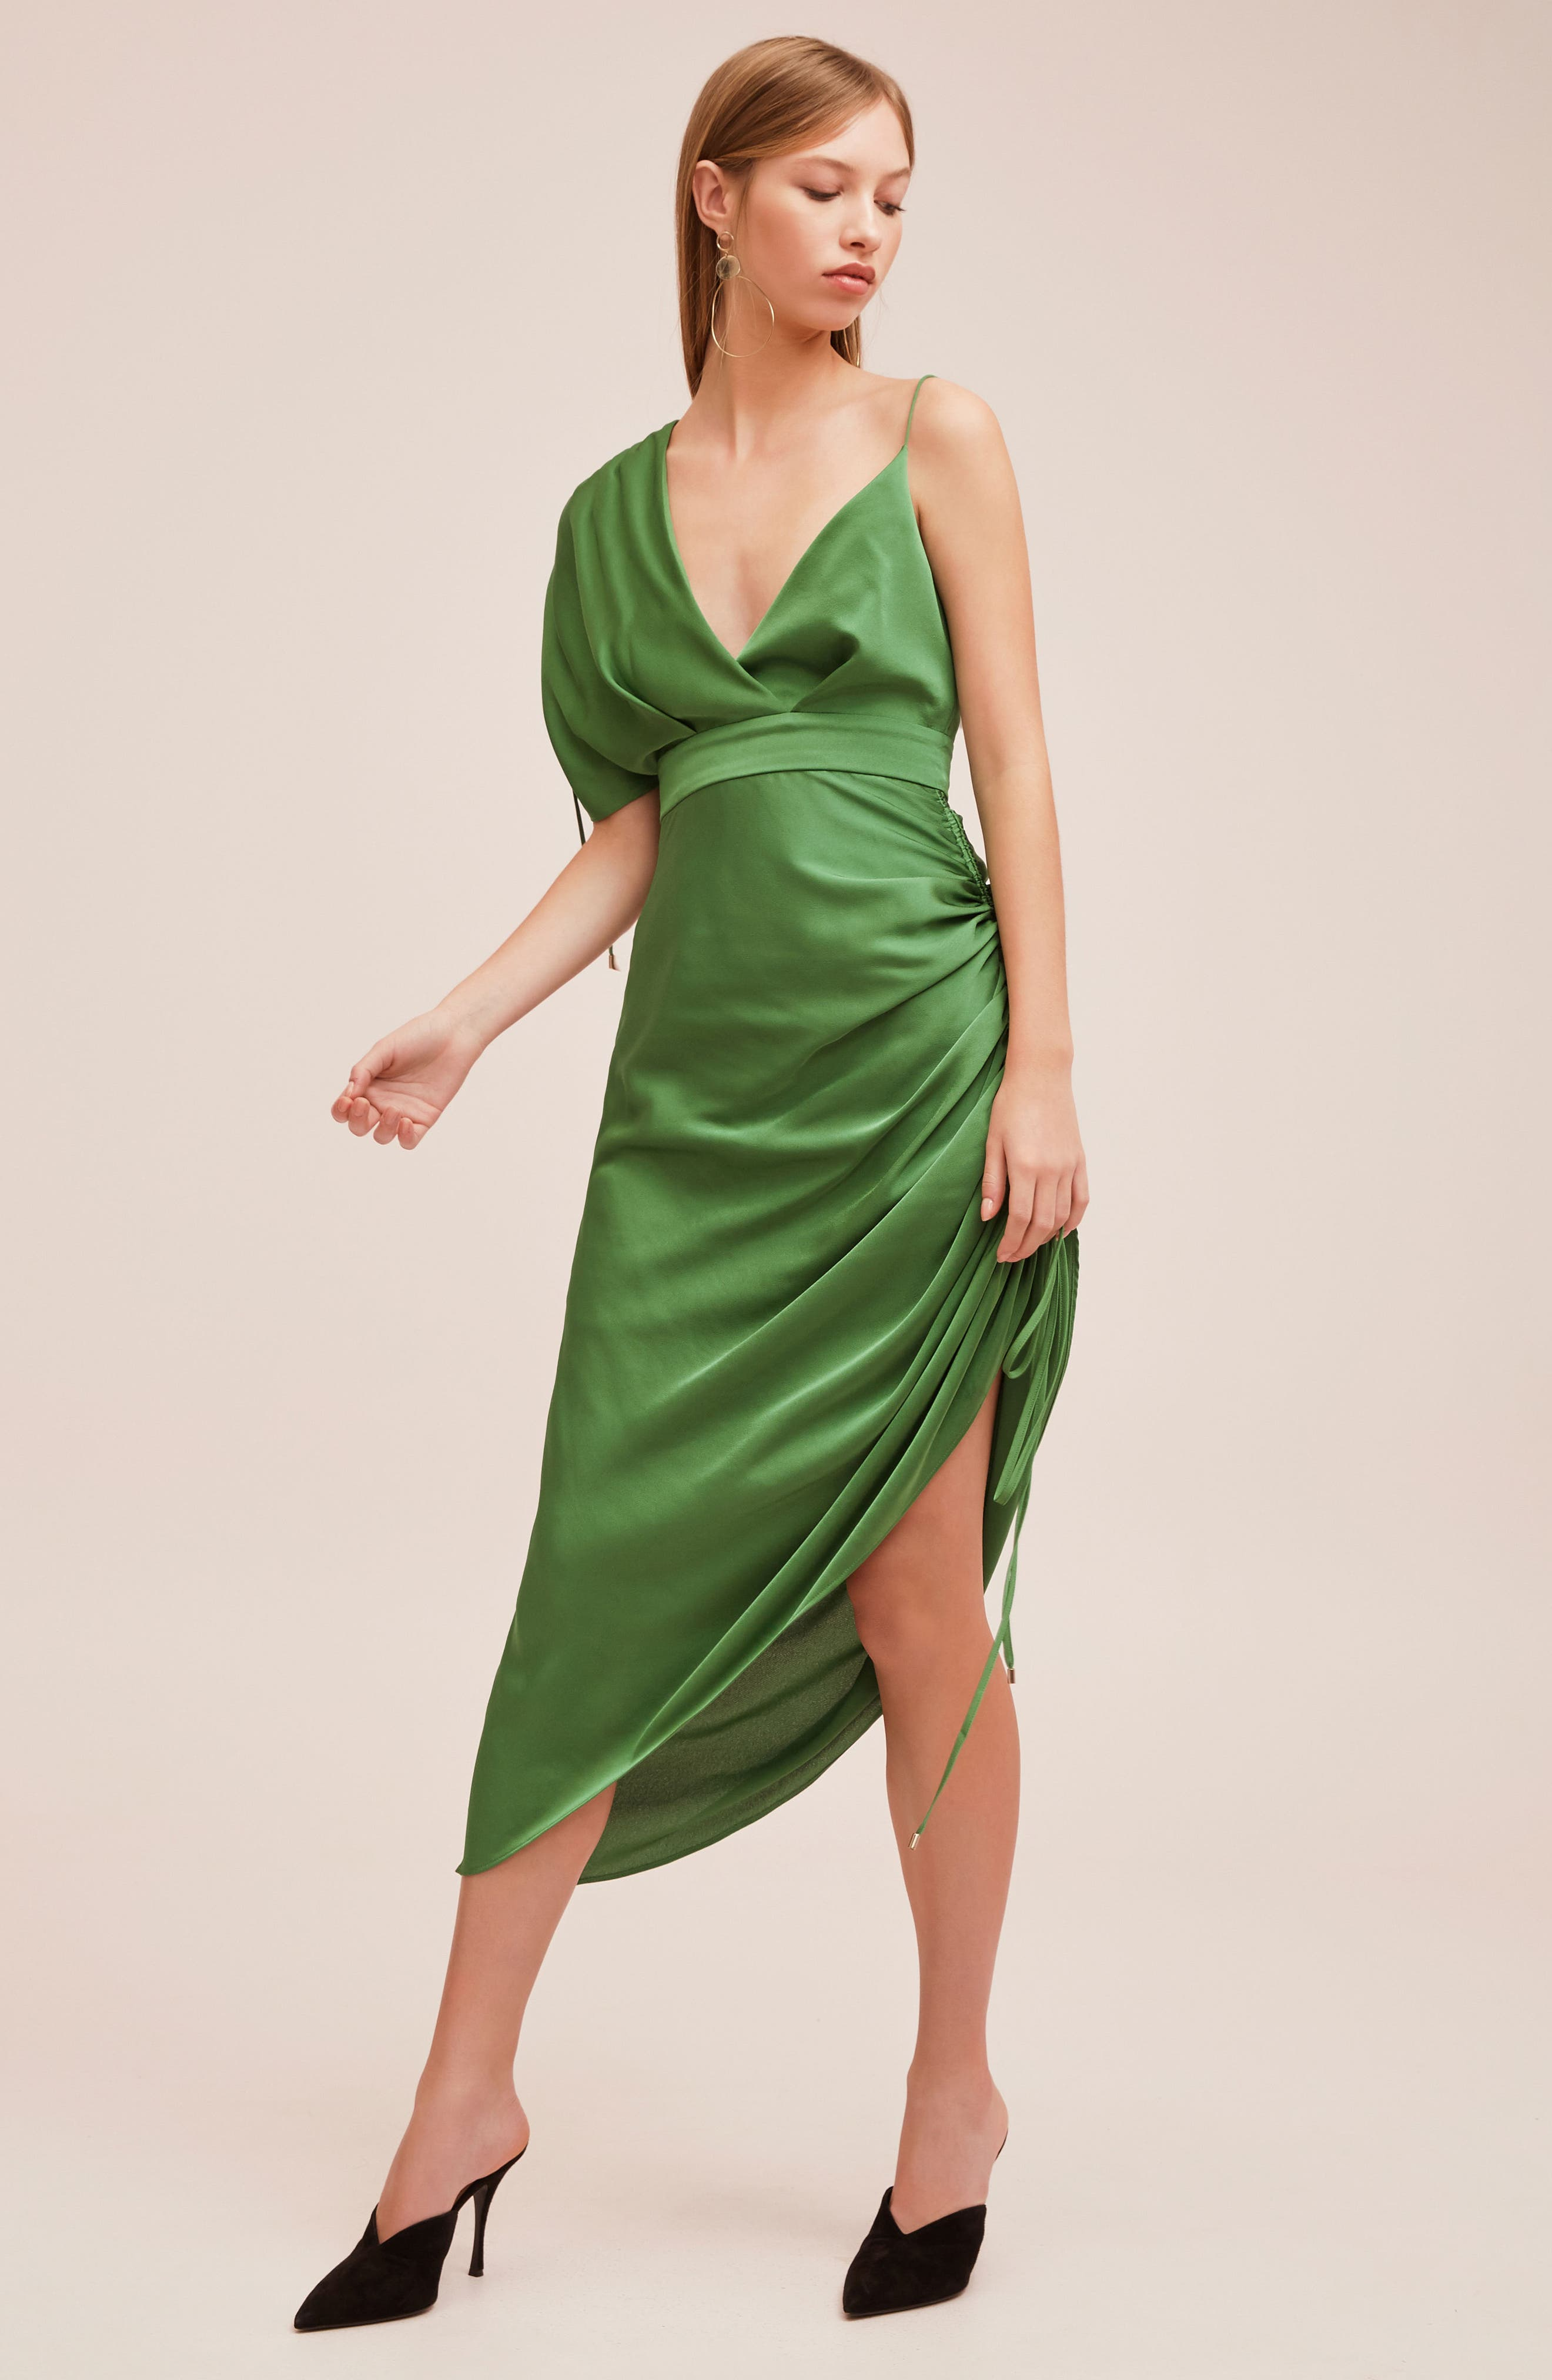 I've Got You Asymmetrical Satin Dress,                             Alternate thumbnail 7, color,                             310